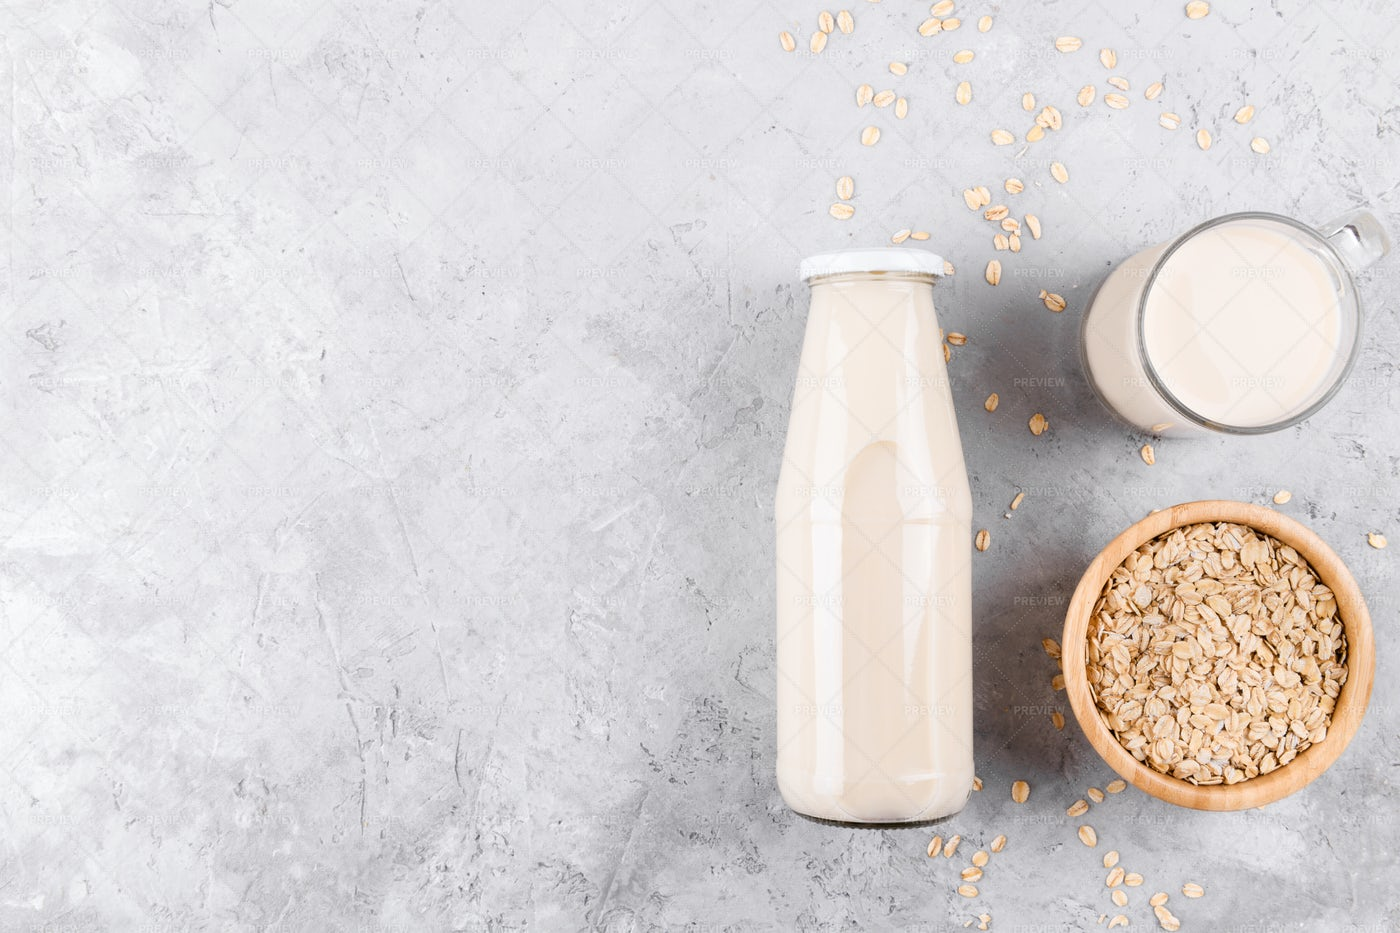 Vegan Oat Milk: Stock Photos